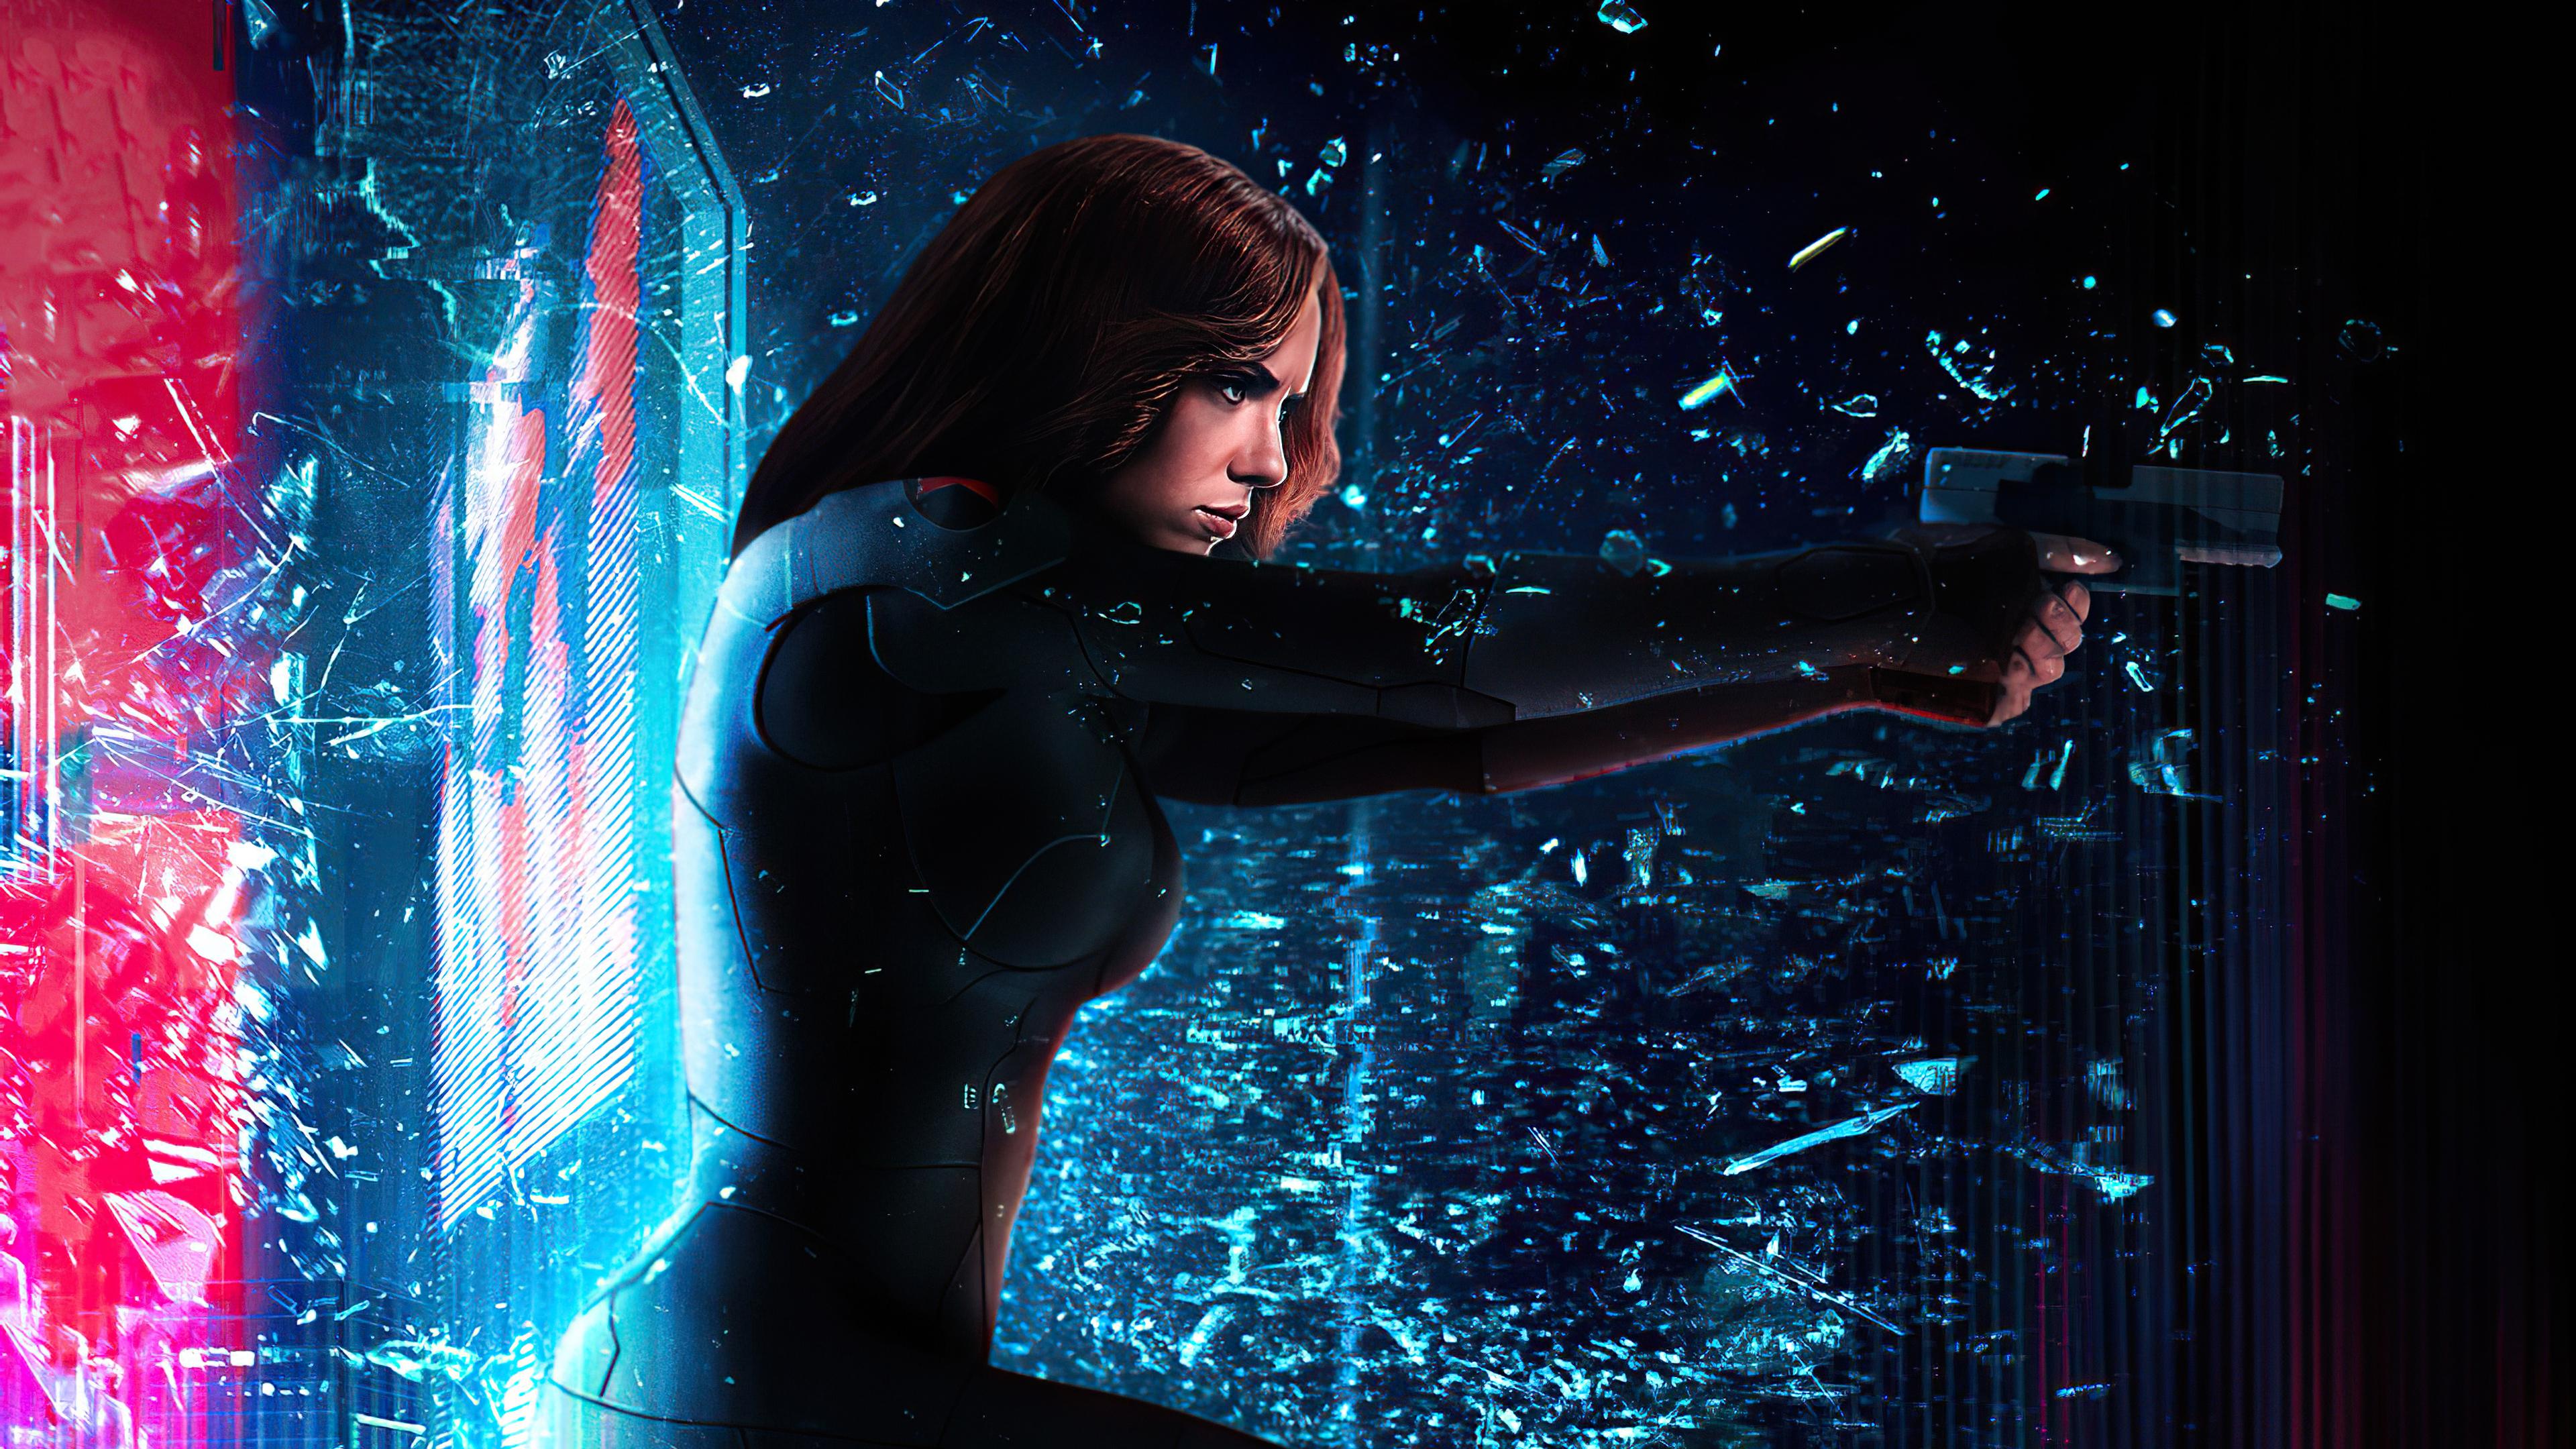 Marvel Comics Marvel Cinematic Universe Black Widow Mizuri AU 3840x2160